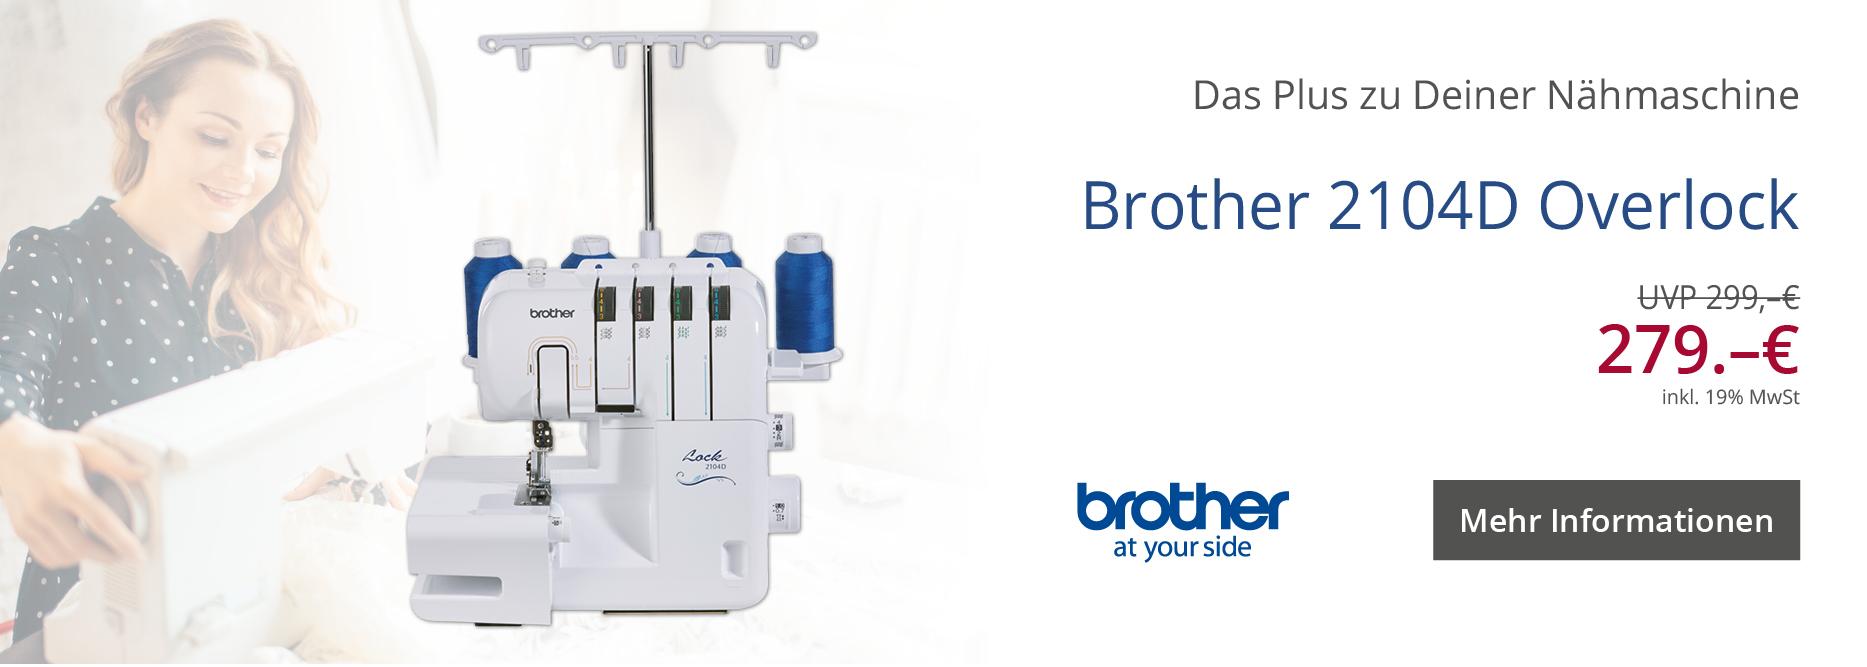 Brother-2104D-Overlock